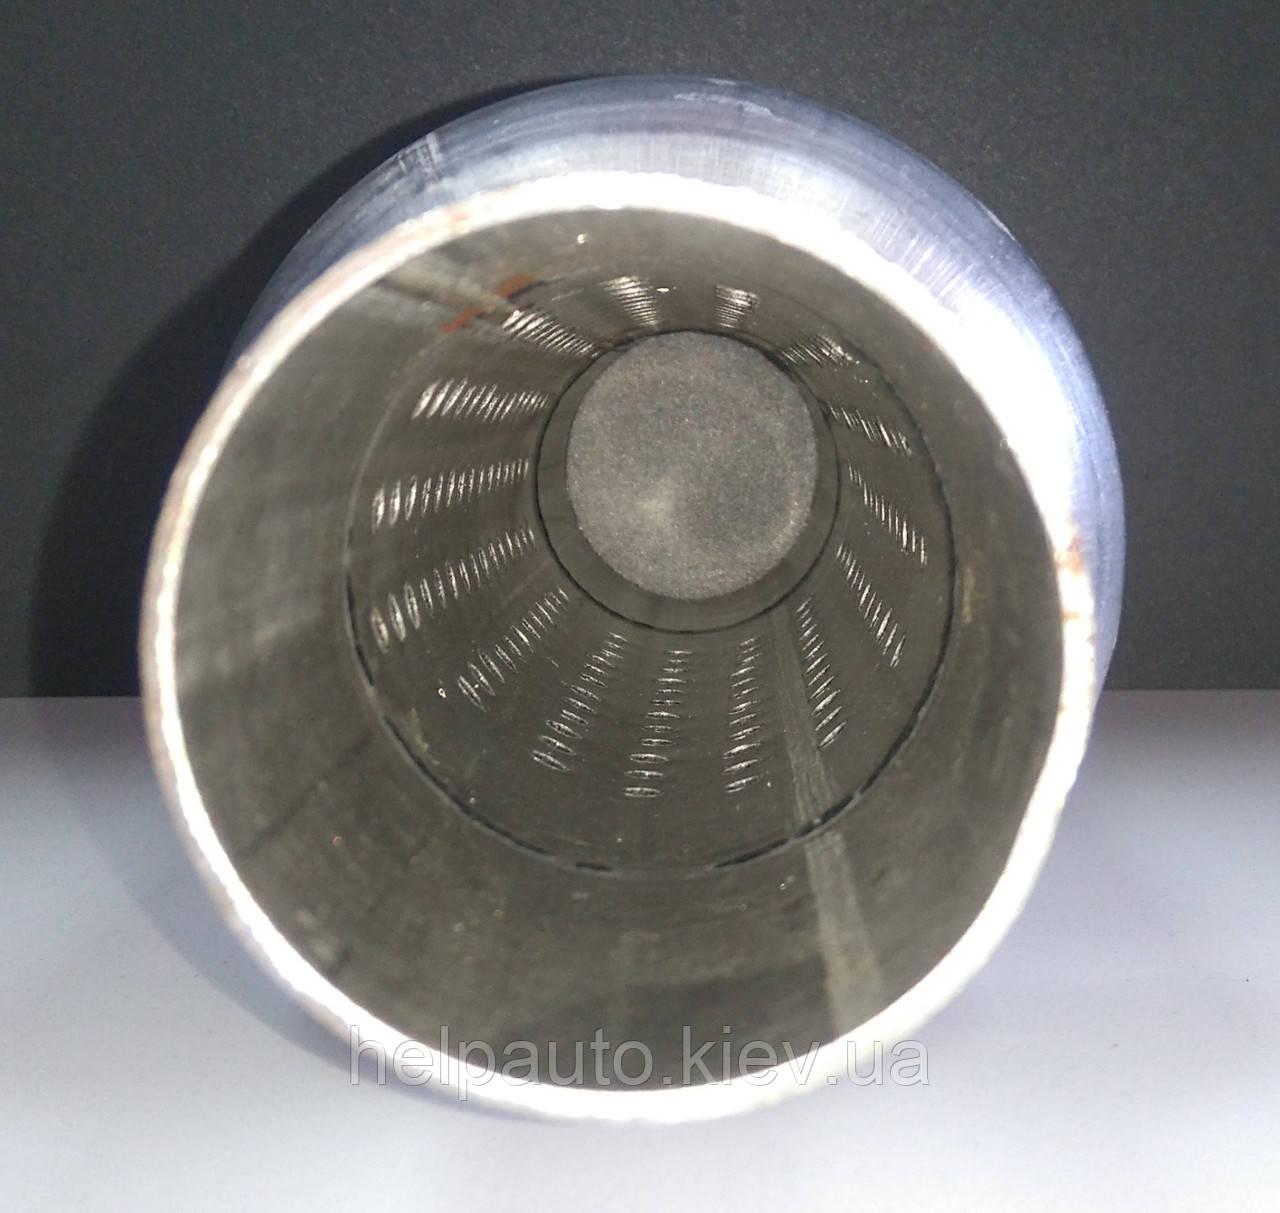 Резонатор (пламегаситель) 55/400  AWG POLONEZ